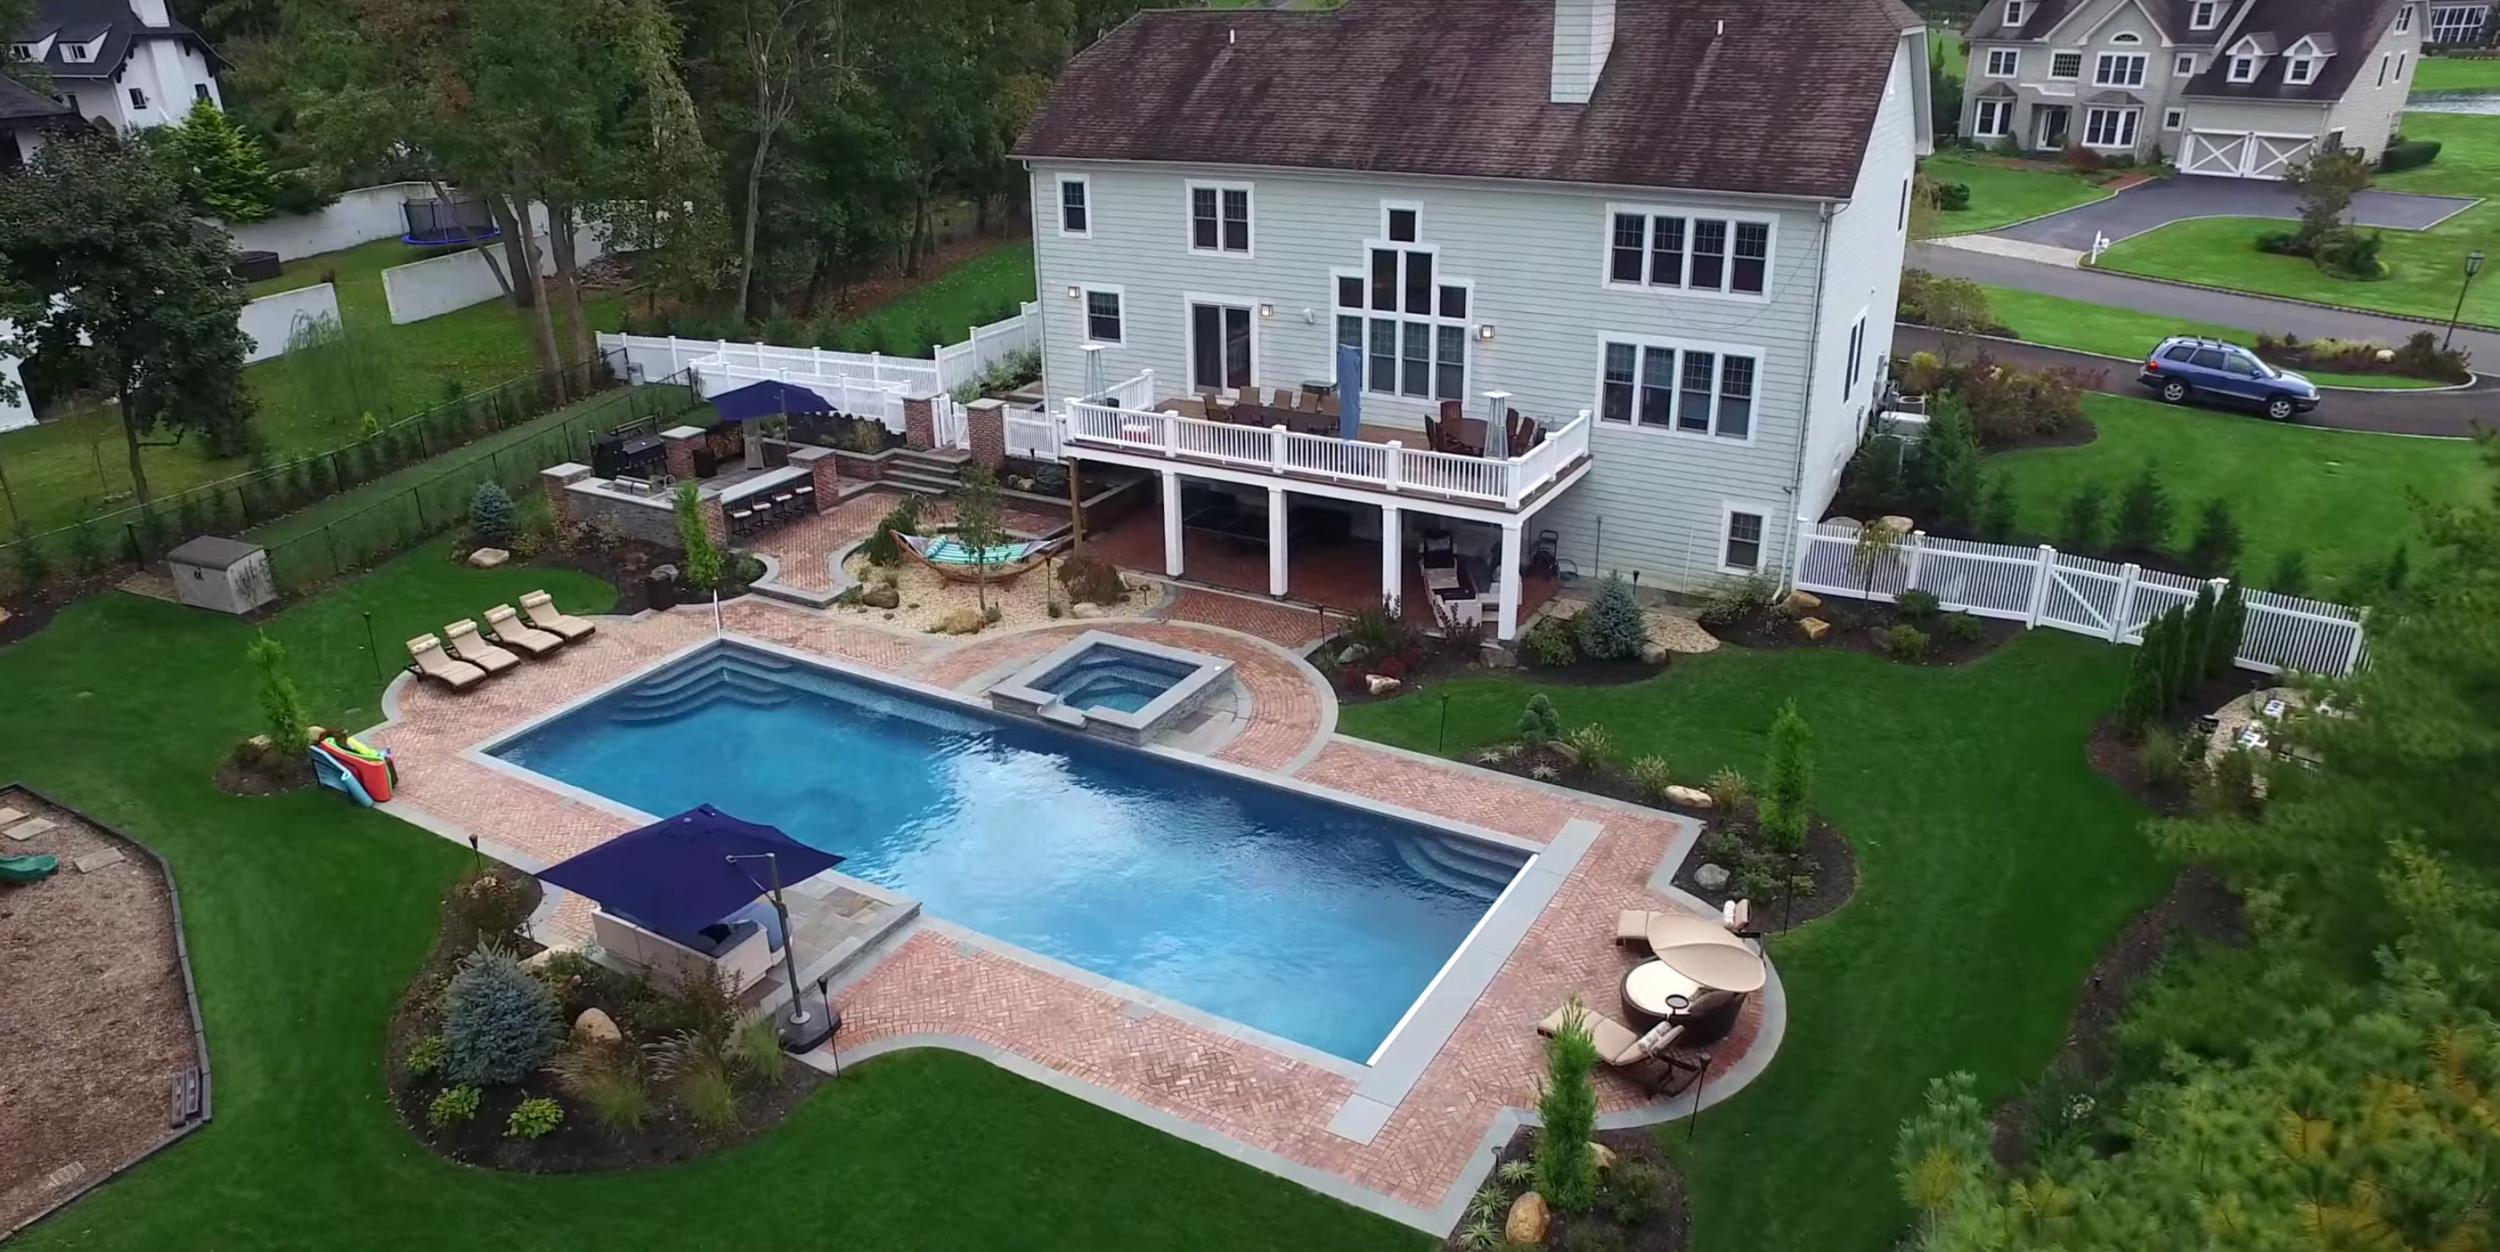 Quality landscape design in Glen Cove, NY